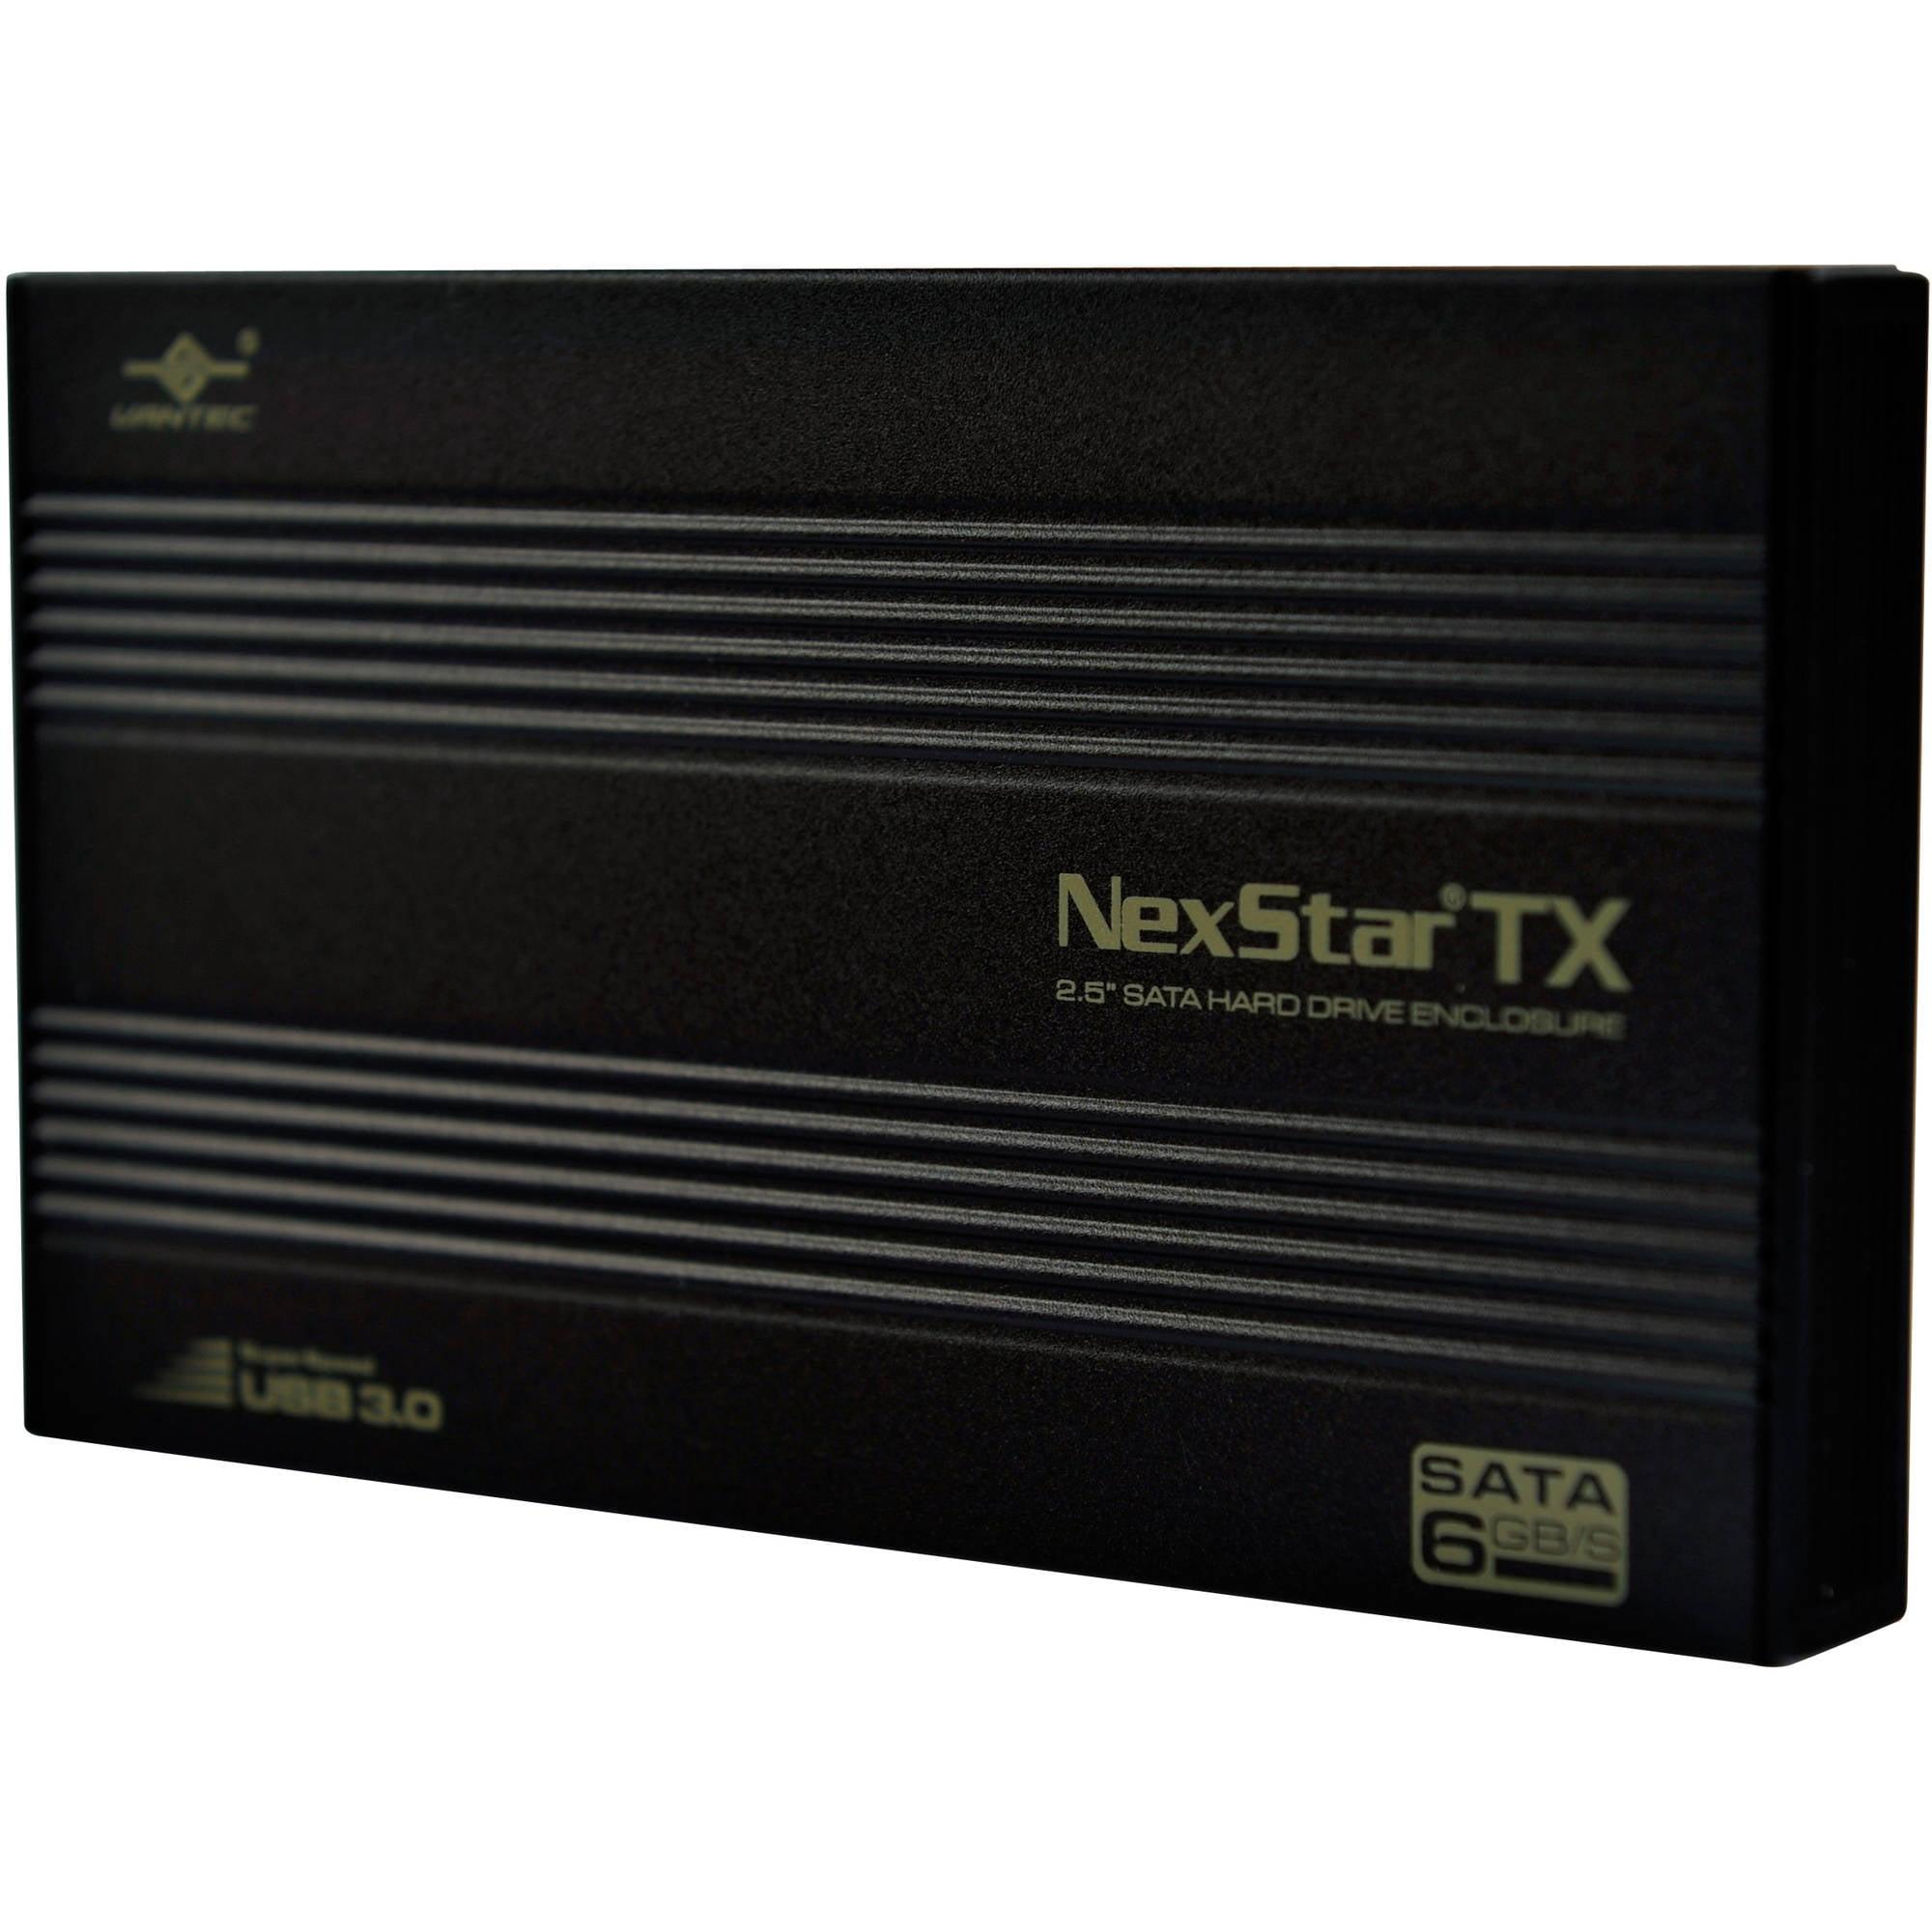 "Vantec NST-216S3-BK NexStar TX 2.5"" SuperSpeed USB 3.0 External Hard Drive Enclosure, Black"